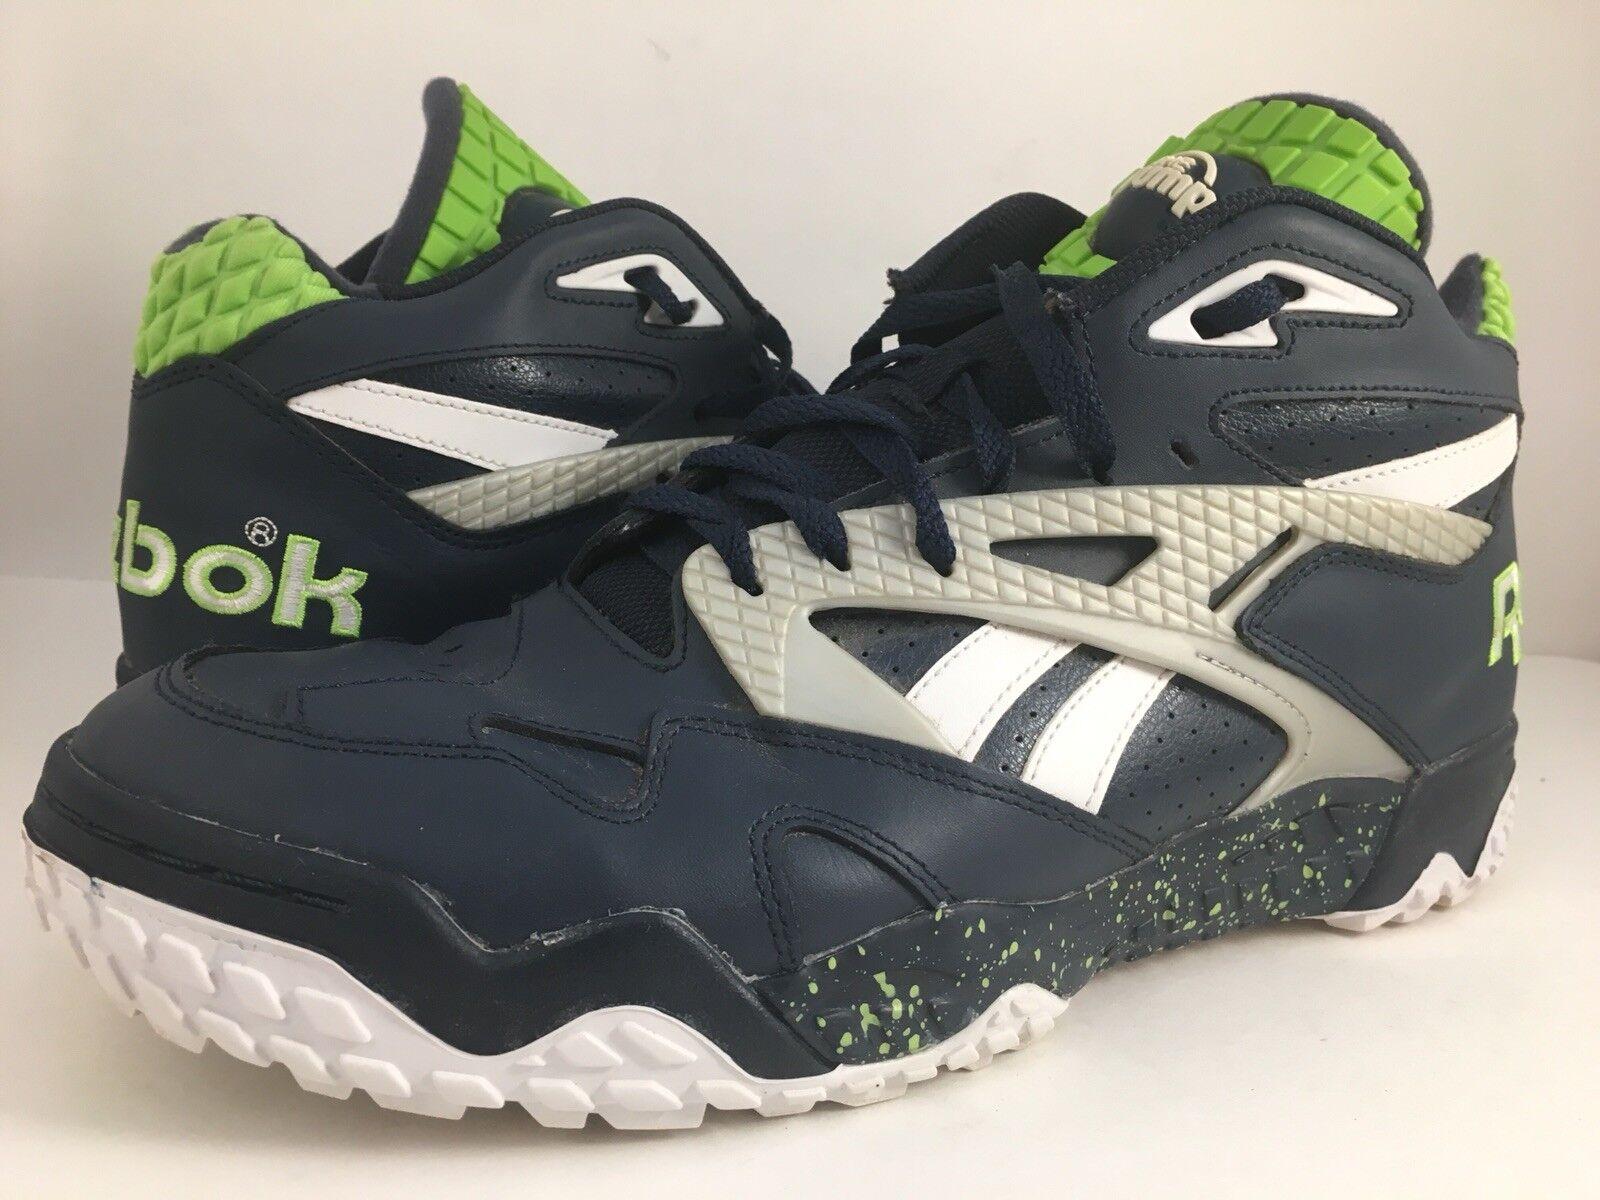 Reebok the Pump  Sneakers Mens 11.5 046501 1013 Retro bluee White Green